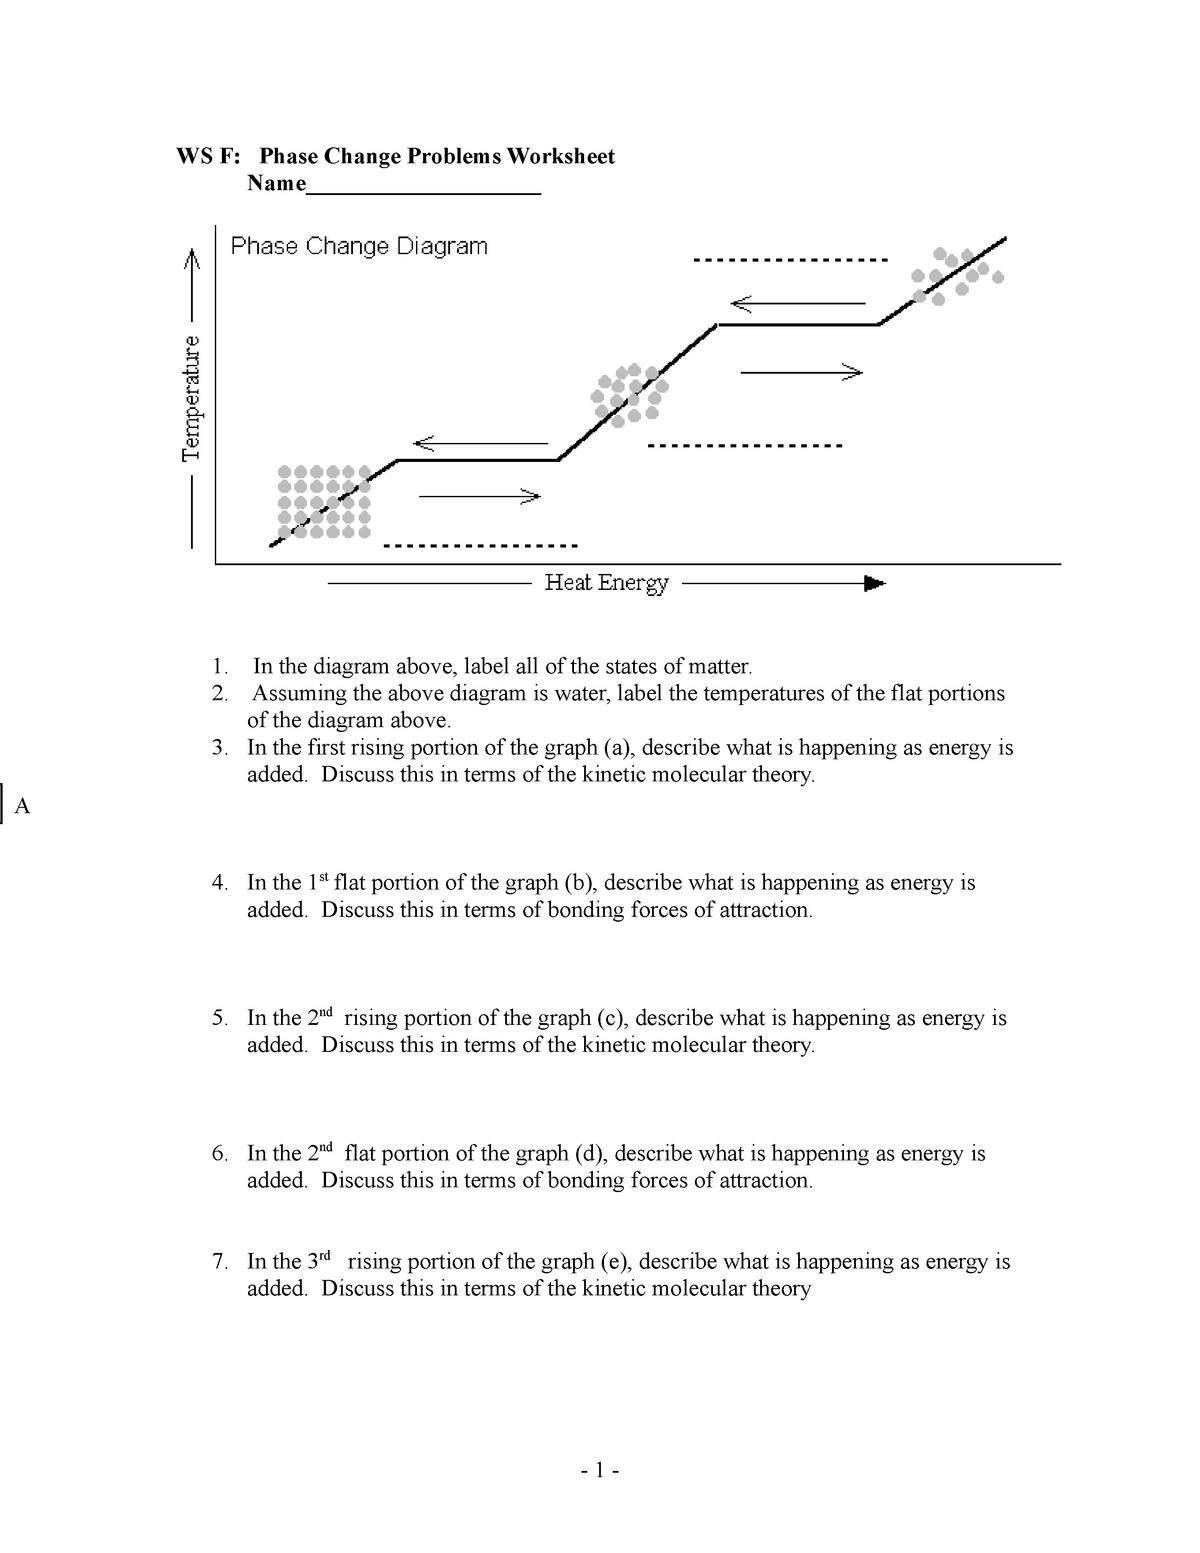 WS F Phase Change Problems Worksheet   StuDocu